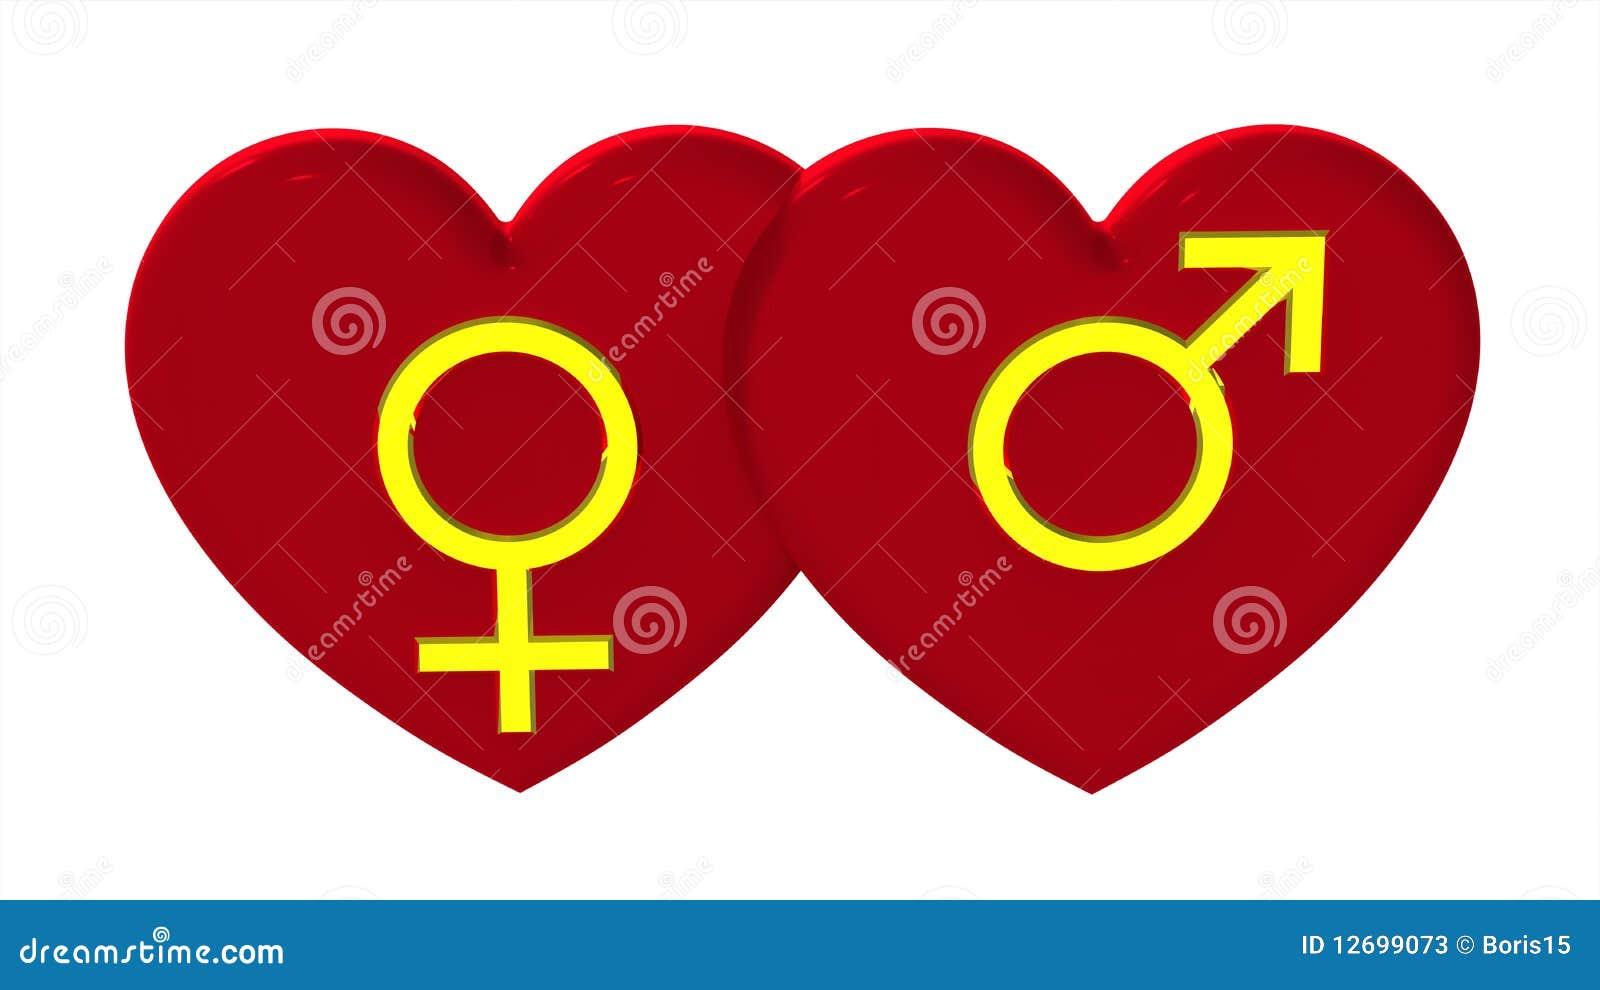 Male and female sex symbols with hearts stock illustration male and female sex symbols with hearts buycottarizona